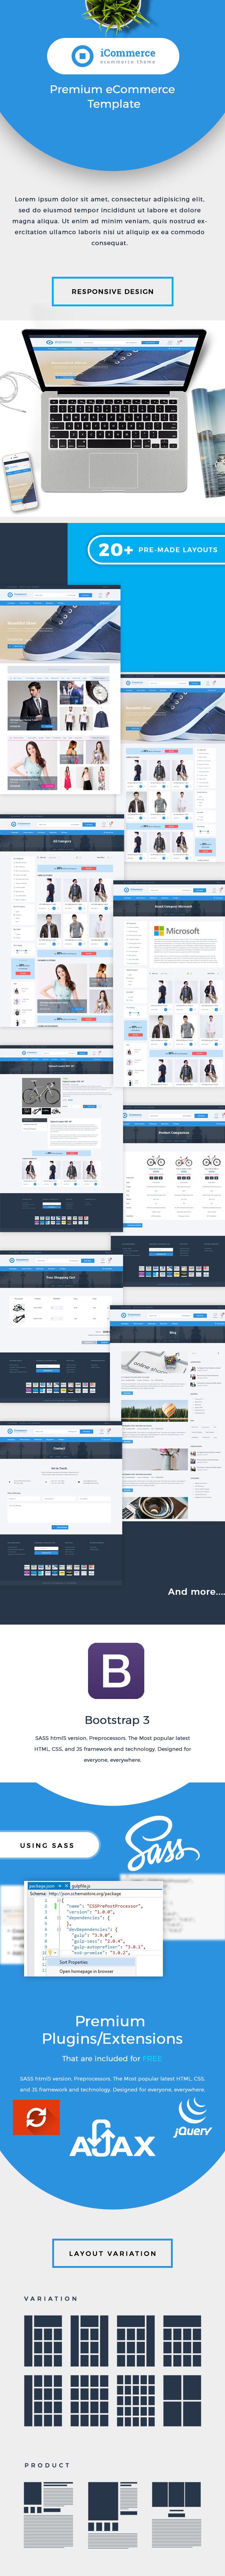 iCommerce - Ecommerce HTML Template - 1